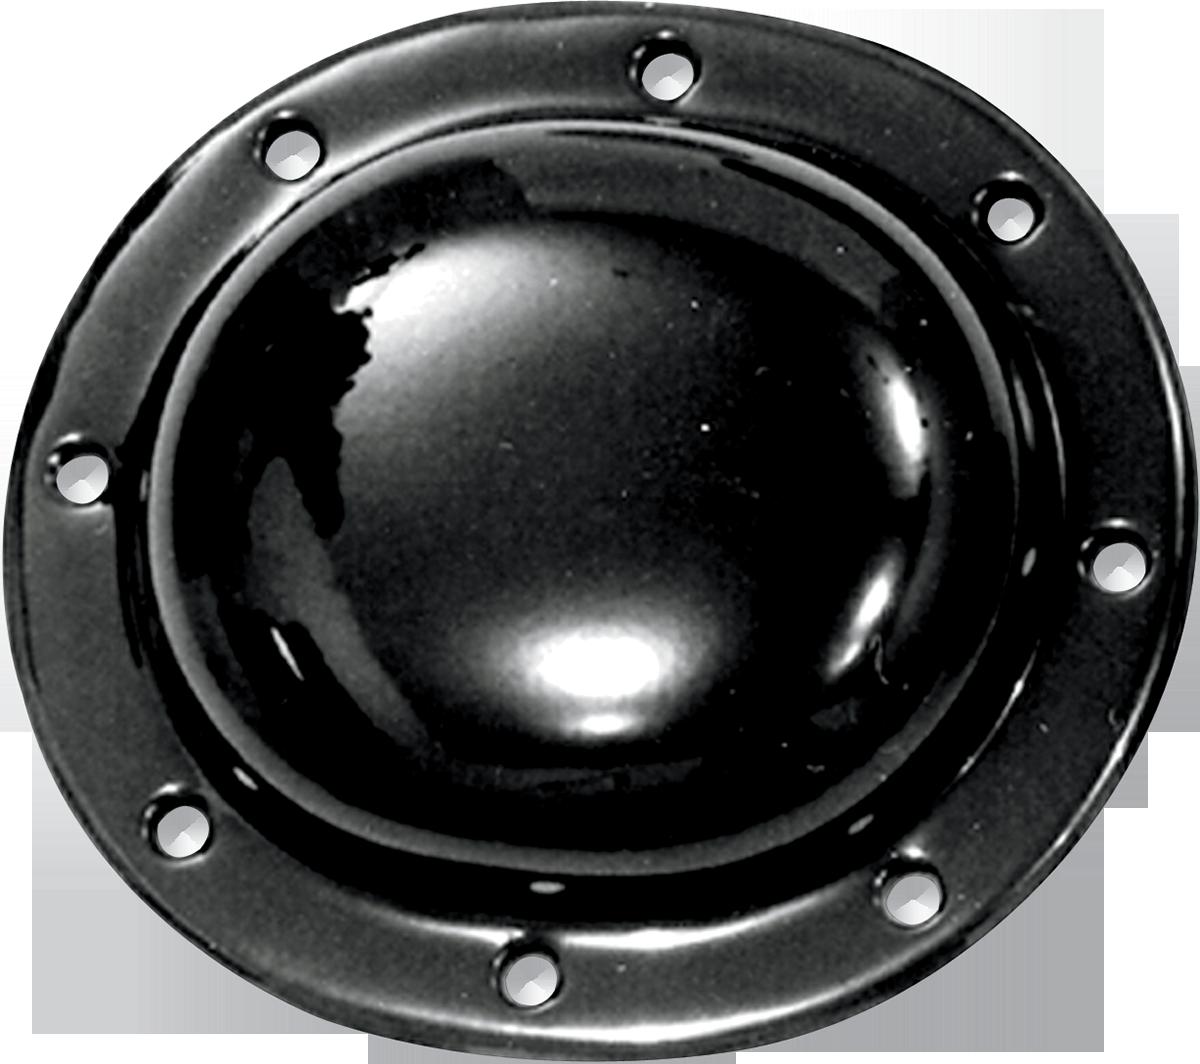 Paughco Gloss Black 8 Hole Derby Cover for 36-64 Harley Knucklehead Hydra Glide